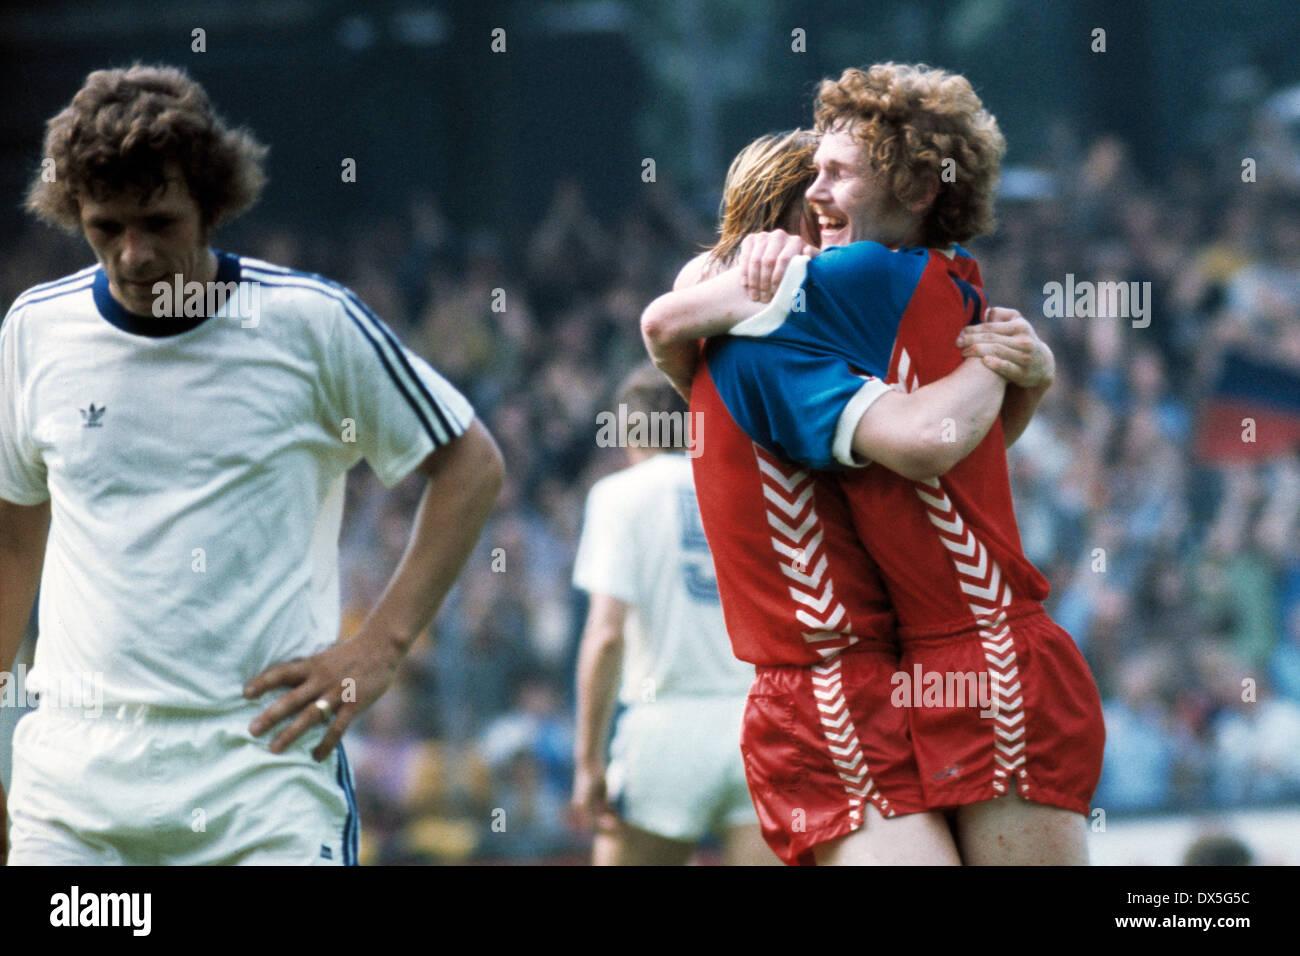 football, 2. Bundesliga Nord, 2. Bundesliga Sued, 1974/1975, relegation match to Bundesliga 1975/1976, return leg, Grotenburg Stadium in Krefeld, FC Bayer 05 Uerdingen versus FK Pirmasens 6:0, rejoicing of the Uerdingen players at 3:0 by Ludwig Lurz (righ - Stock Image